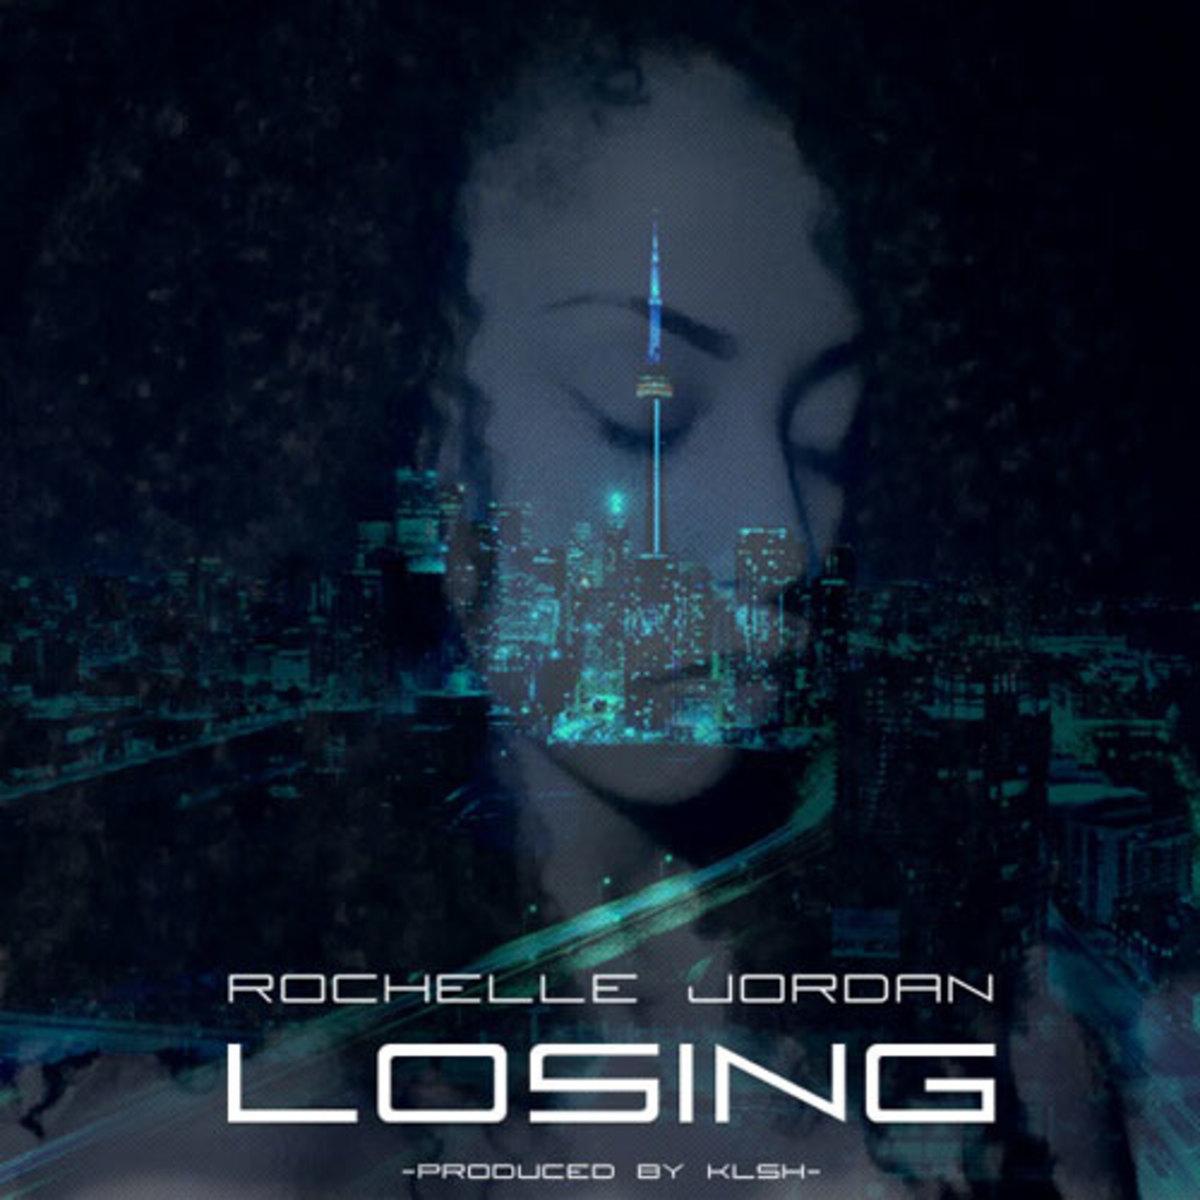 rochellejordan-losing.jpg